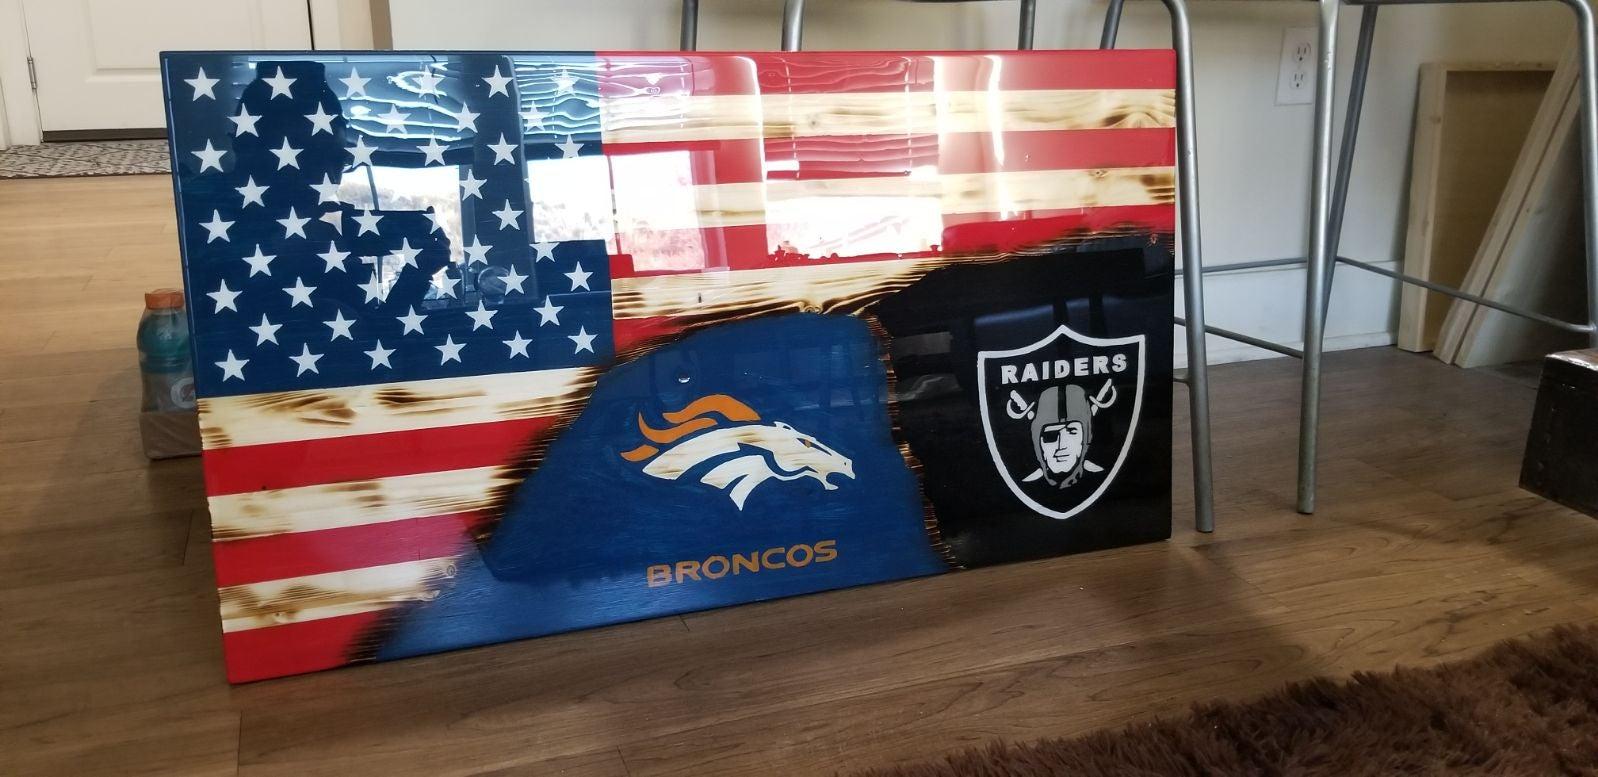 36 x 20 custom team flag